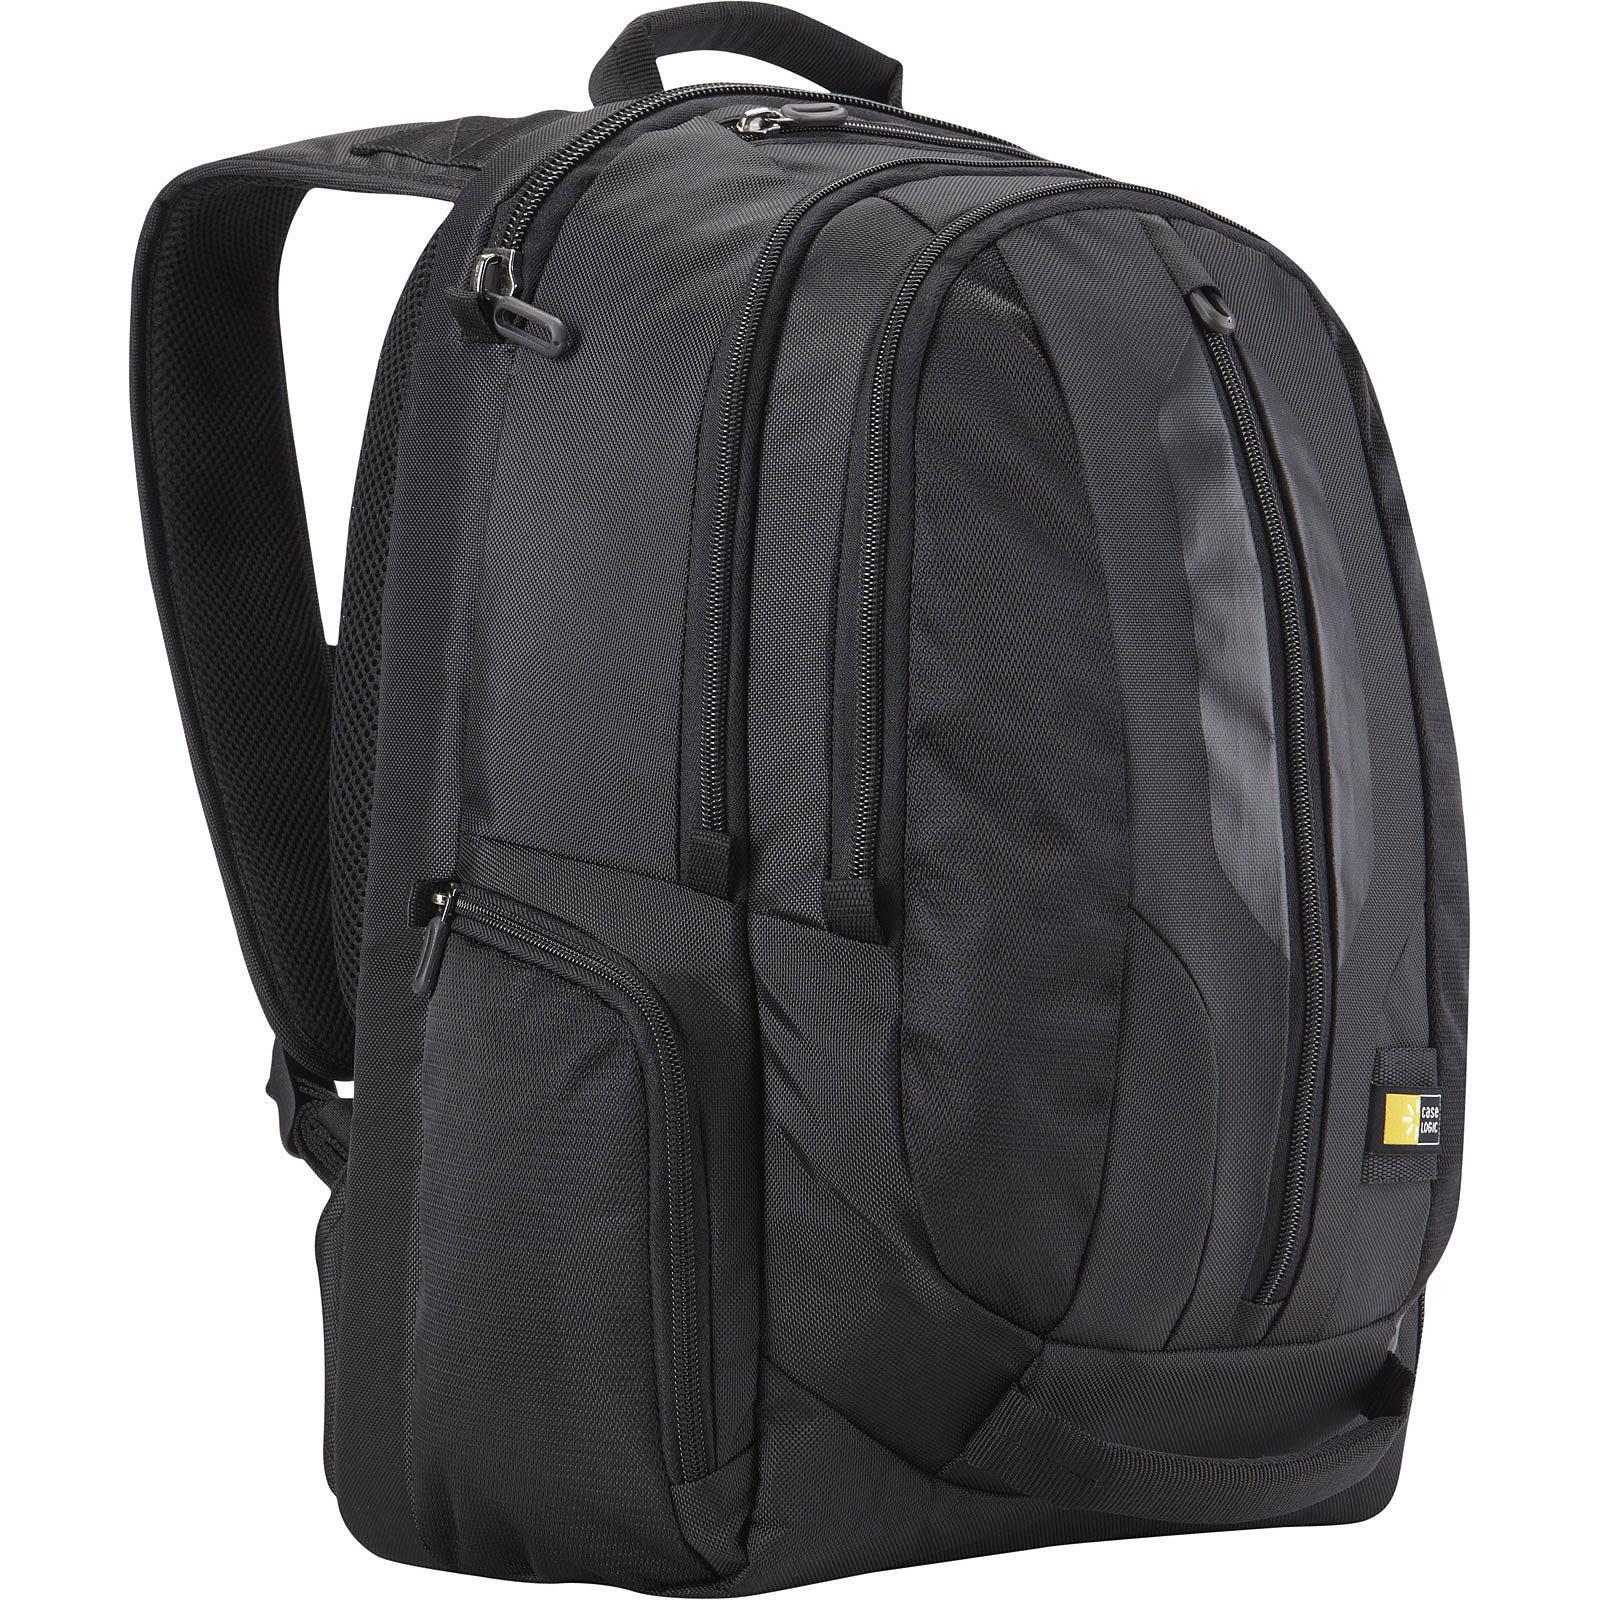 17.3 Laptop Backpack RBP217